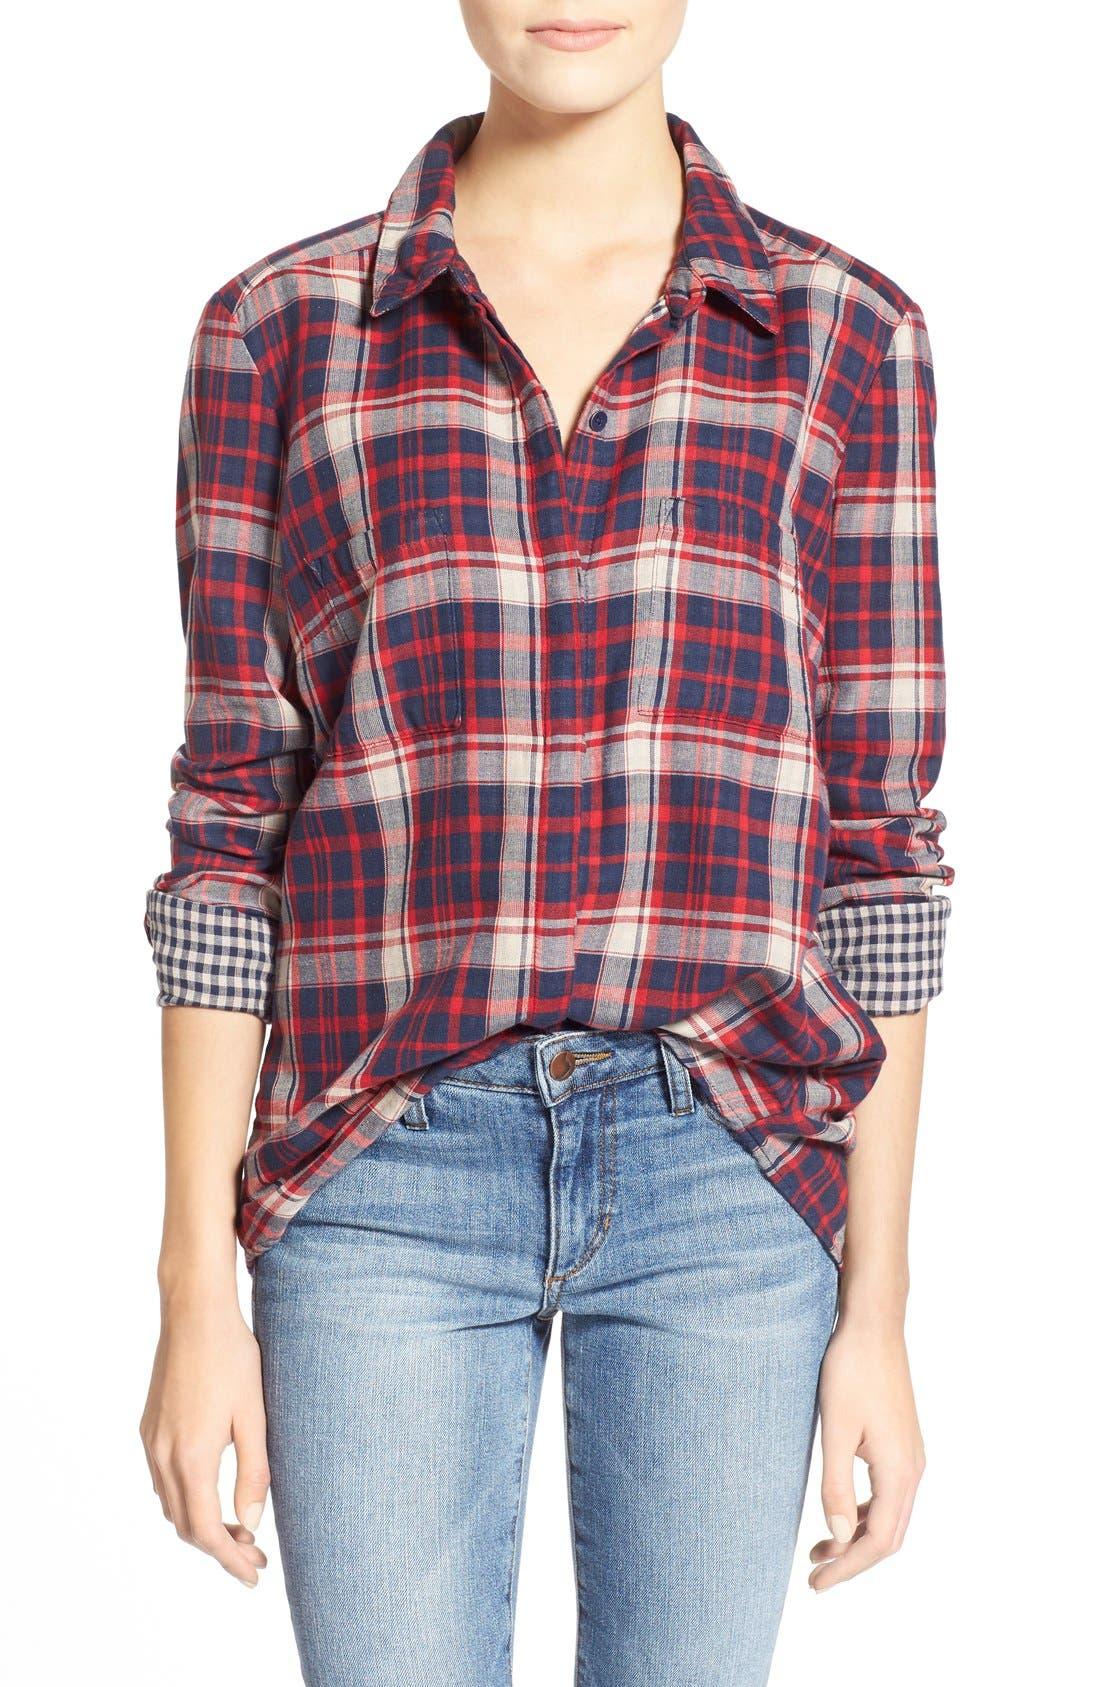 Alternate Image 1 Selected - Splendid'Hunter' Plaid Shirt